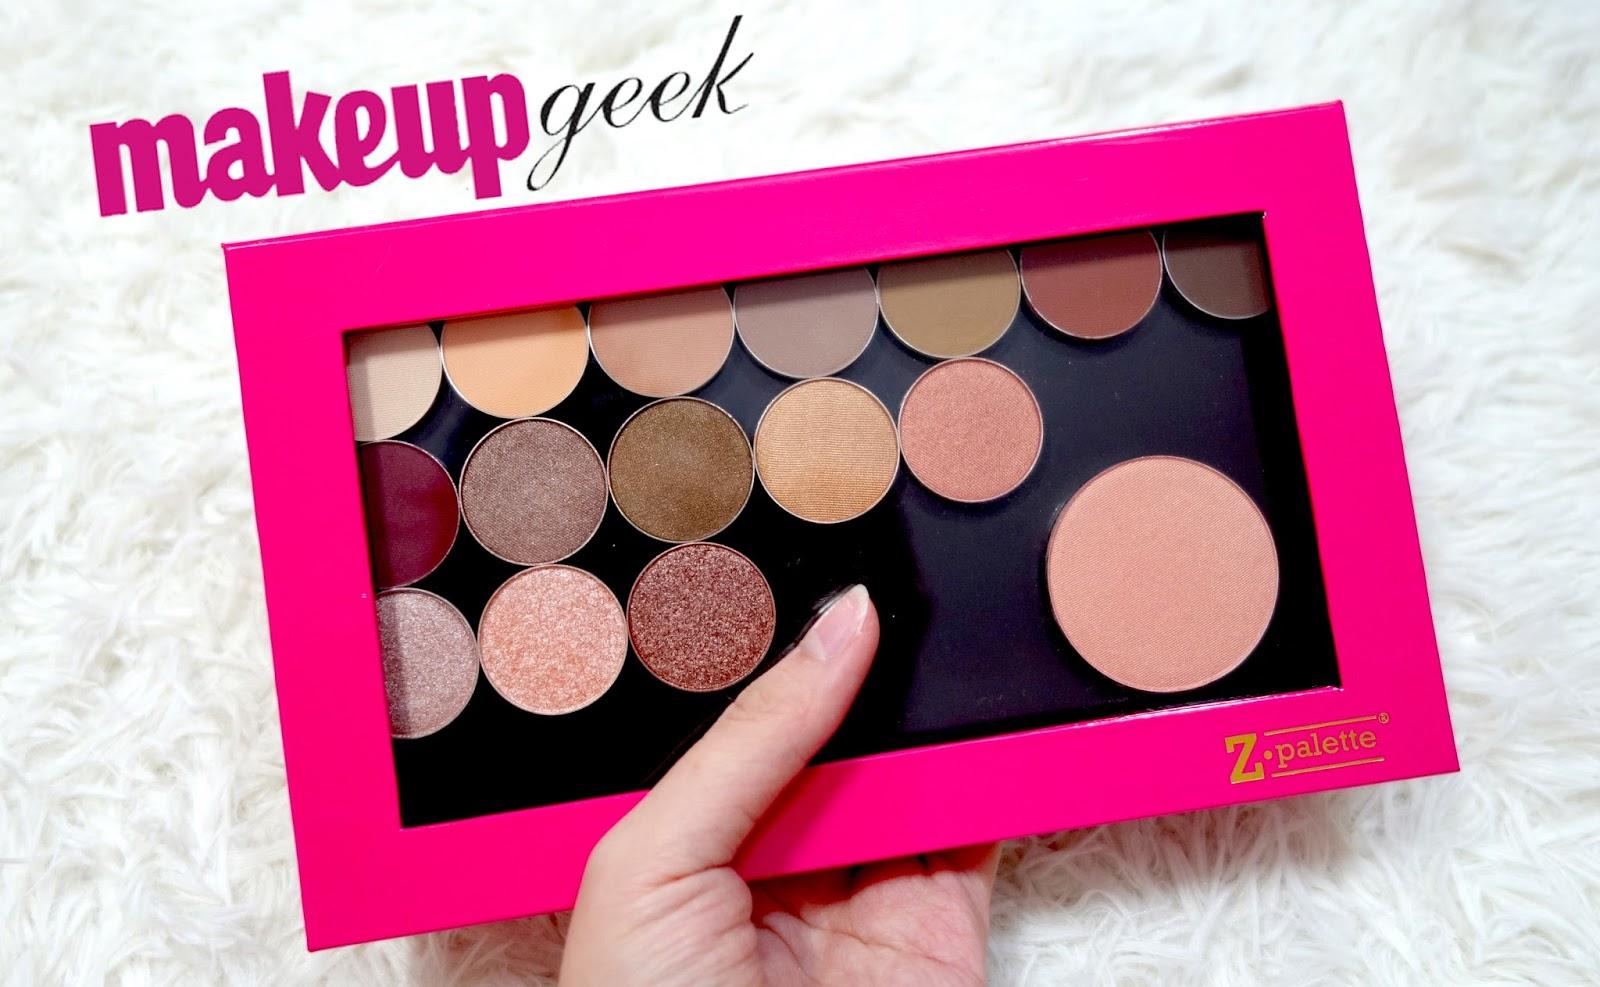 9113e52a806 Makeup Geek | Eye Shadows, Foiled Shadows, Pigments, Blush and ...